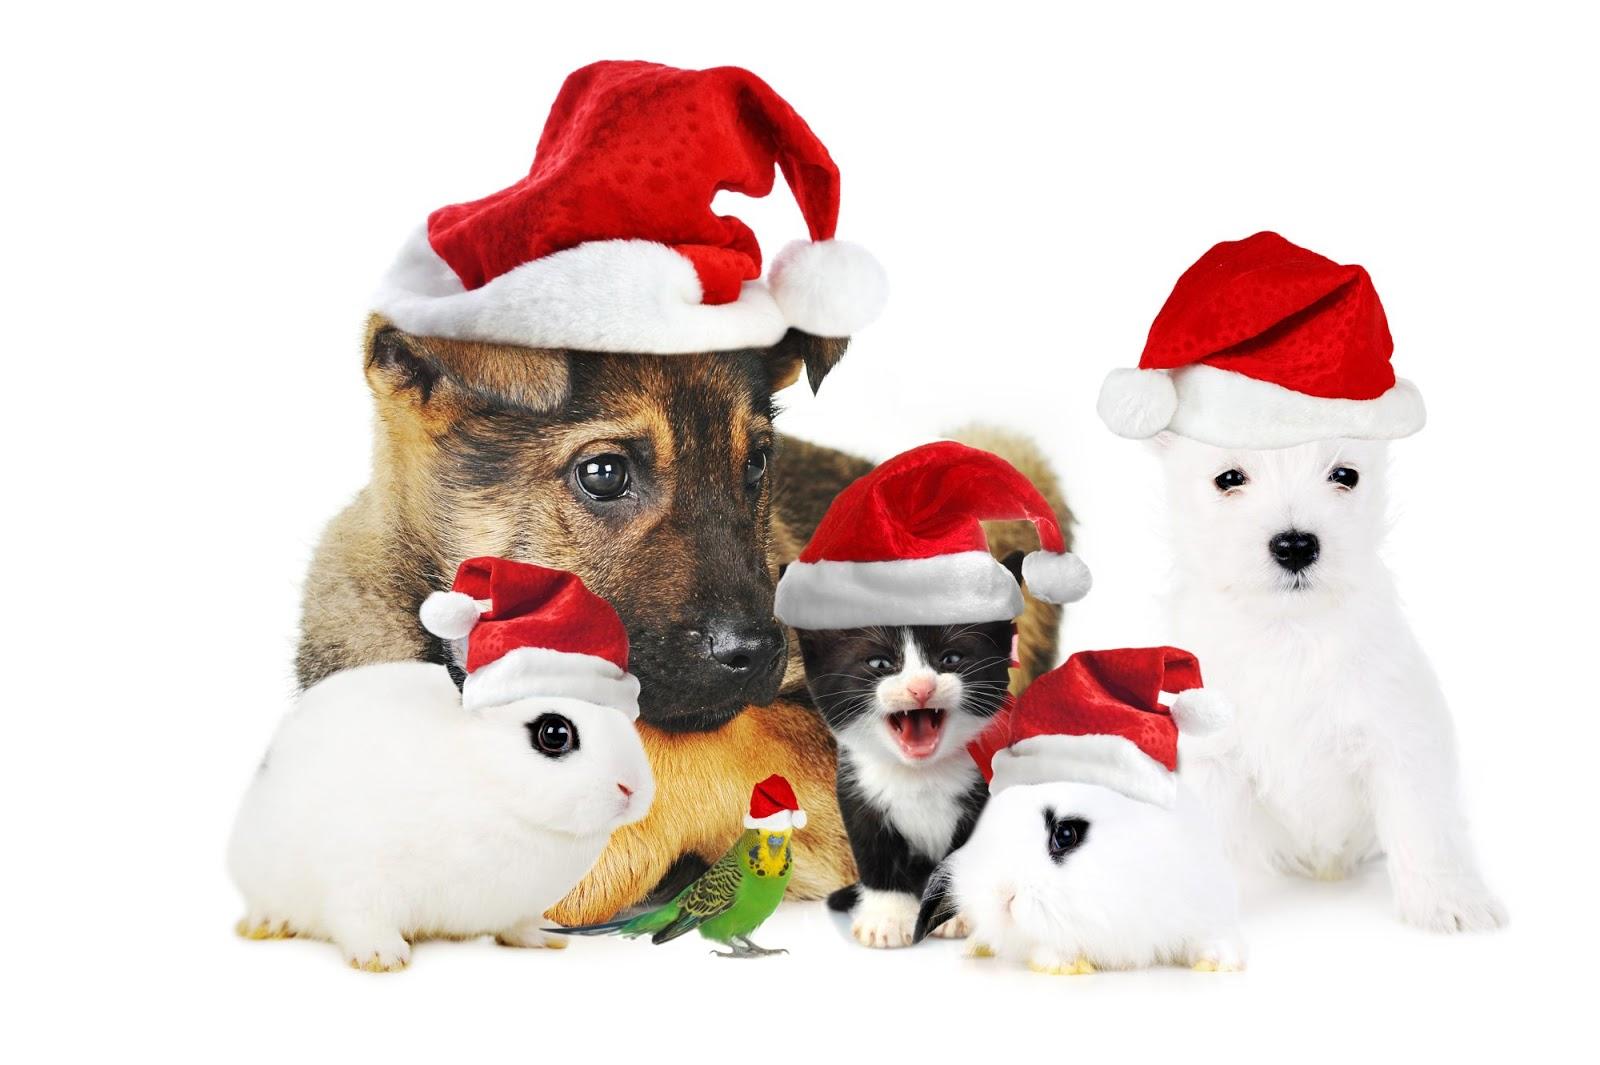 Cute christmas animals - photo#26